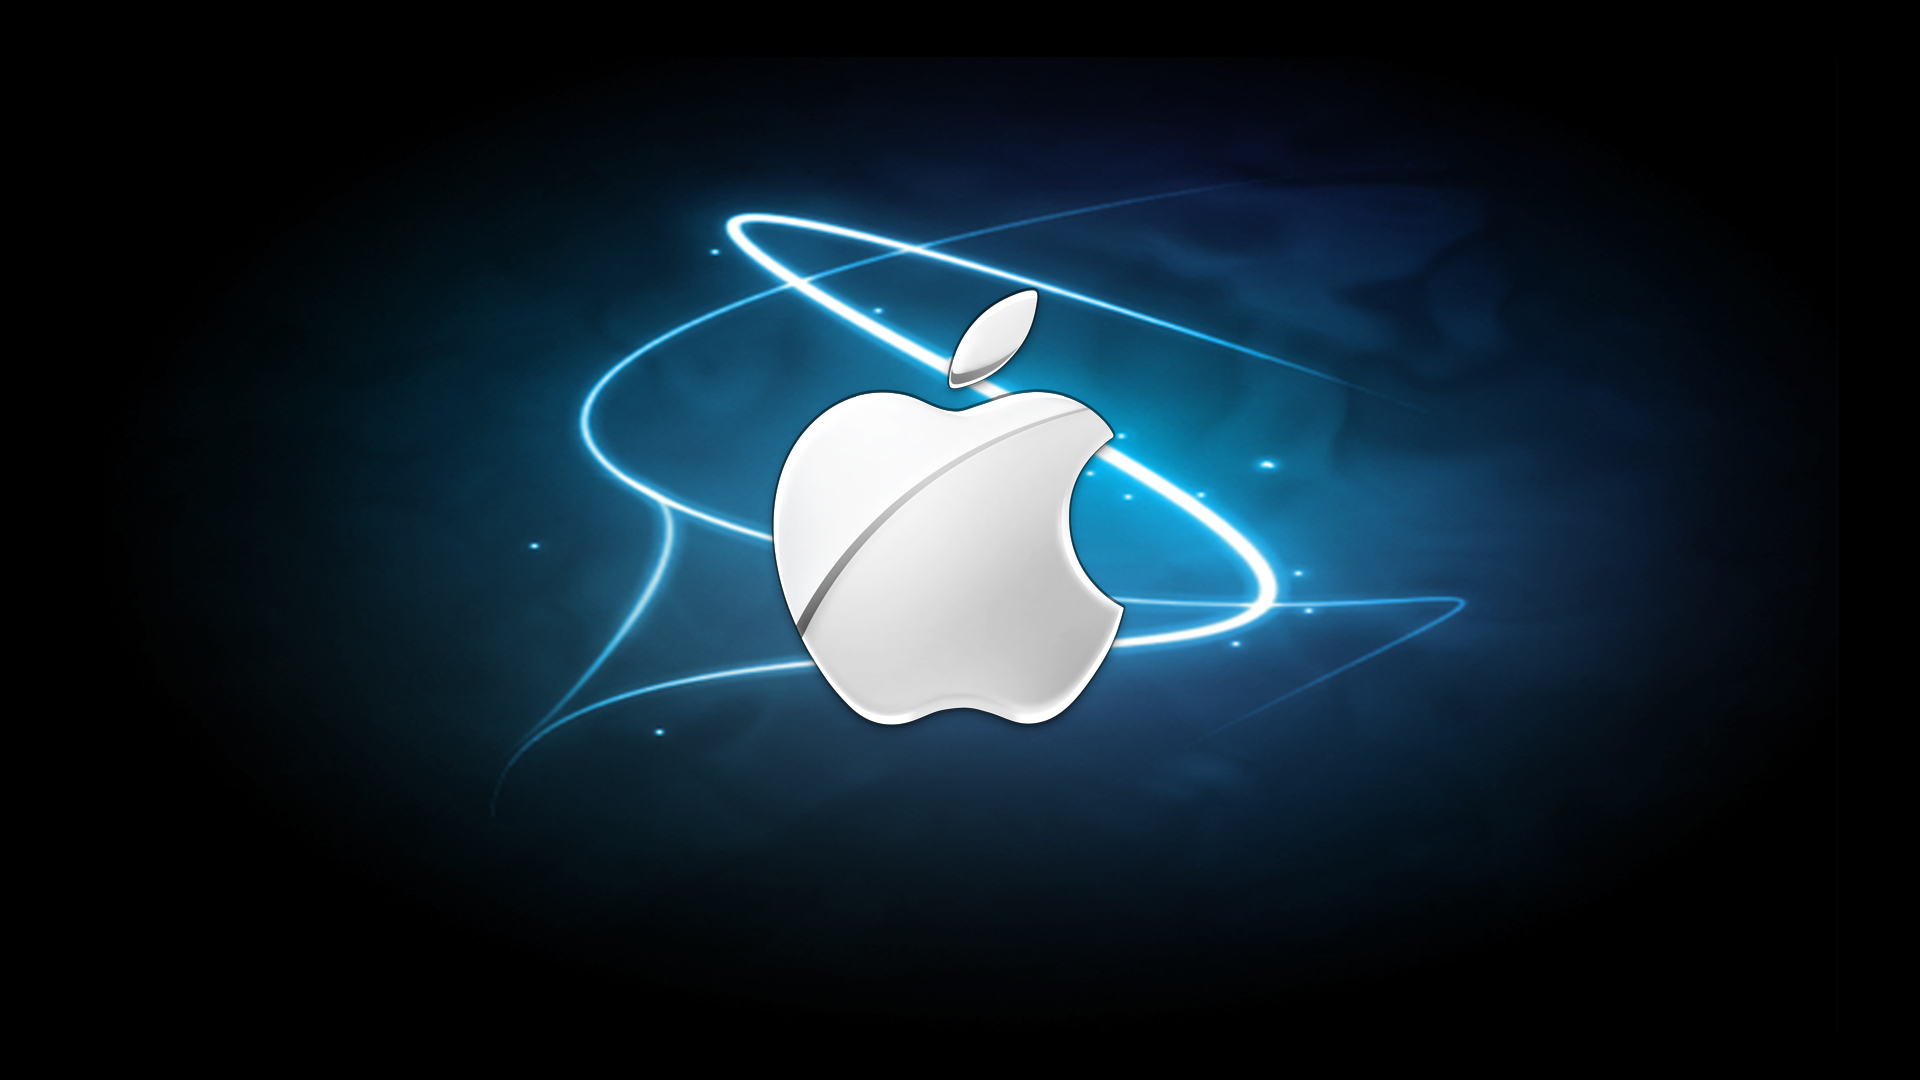 Apple Wallpaper Hd 148734 1920x1080